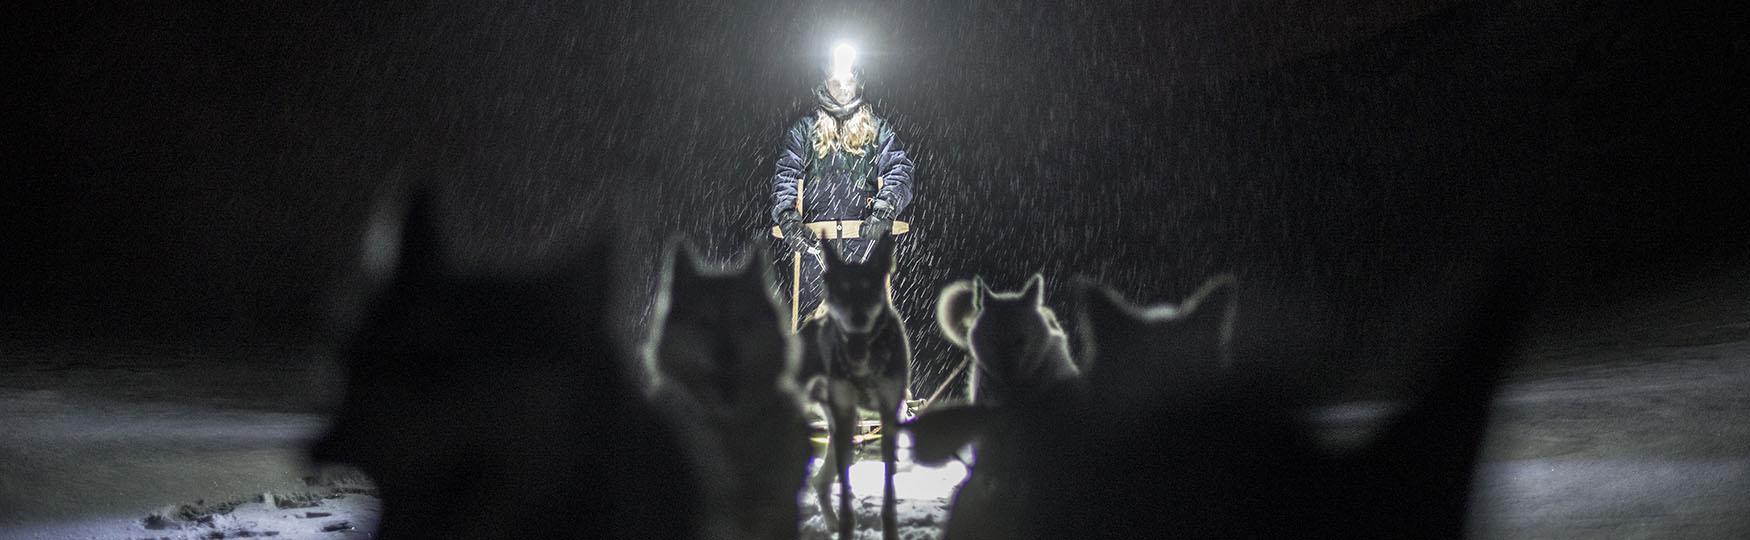 Dogs of Svalbard